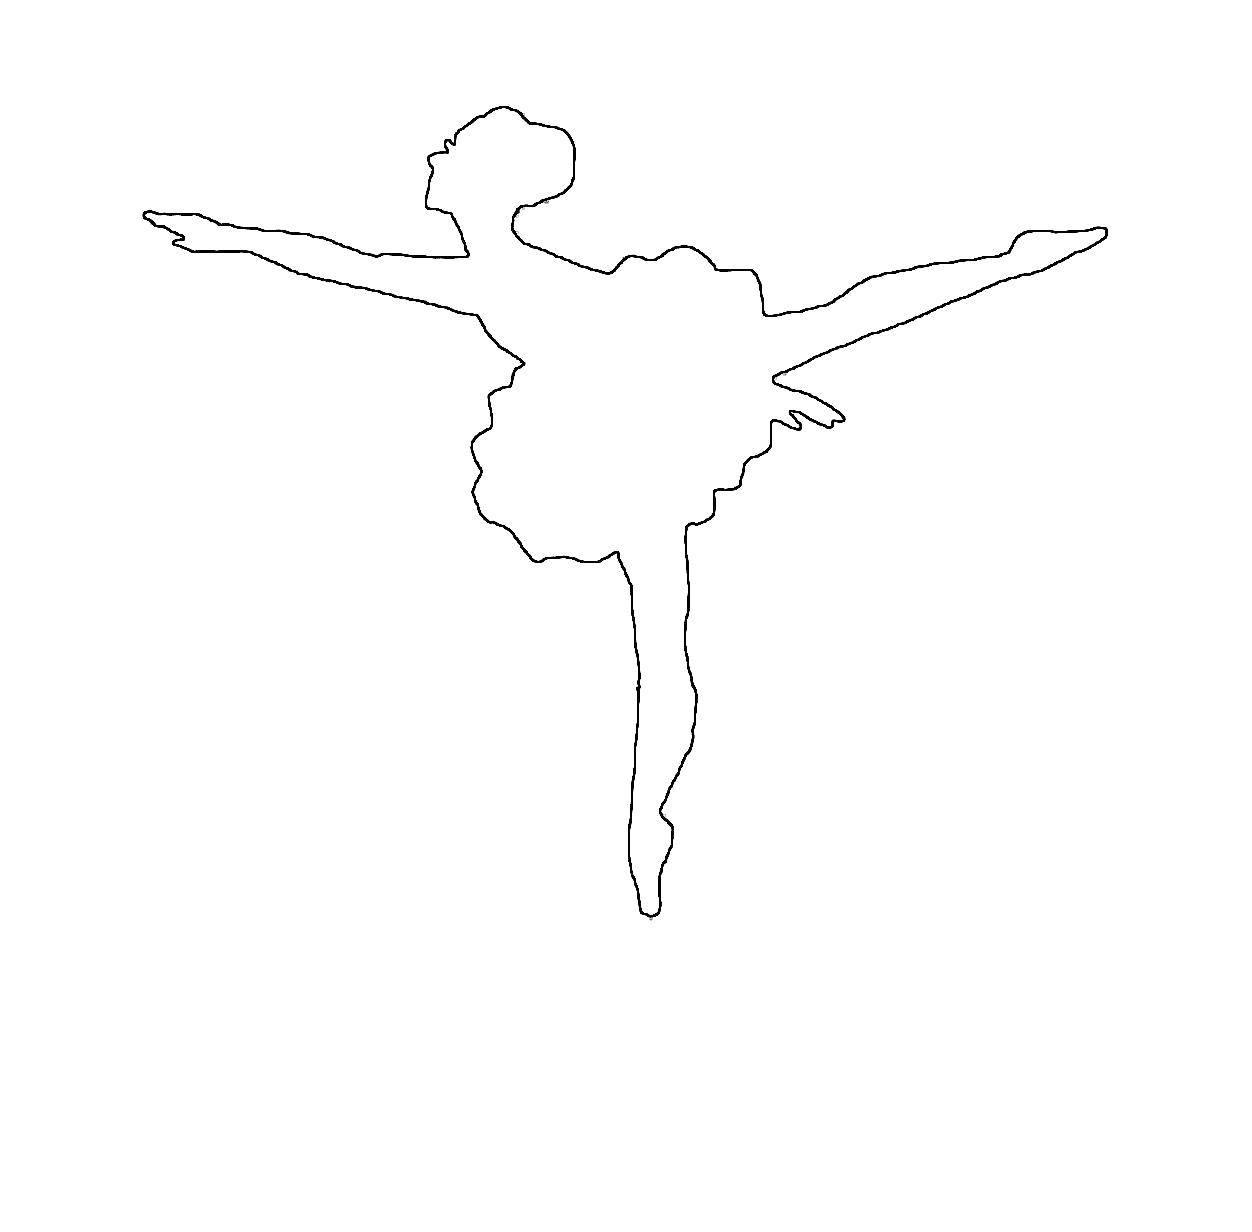 Раскраска Раскраски шаблоны балерин балерина контур, балерина для вырезания из бумаги. Шаблон